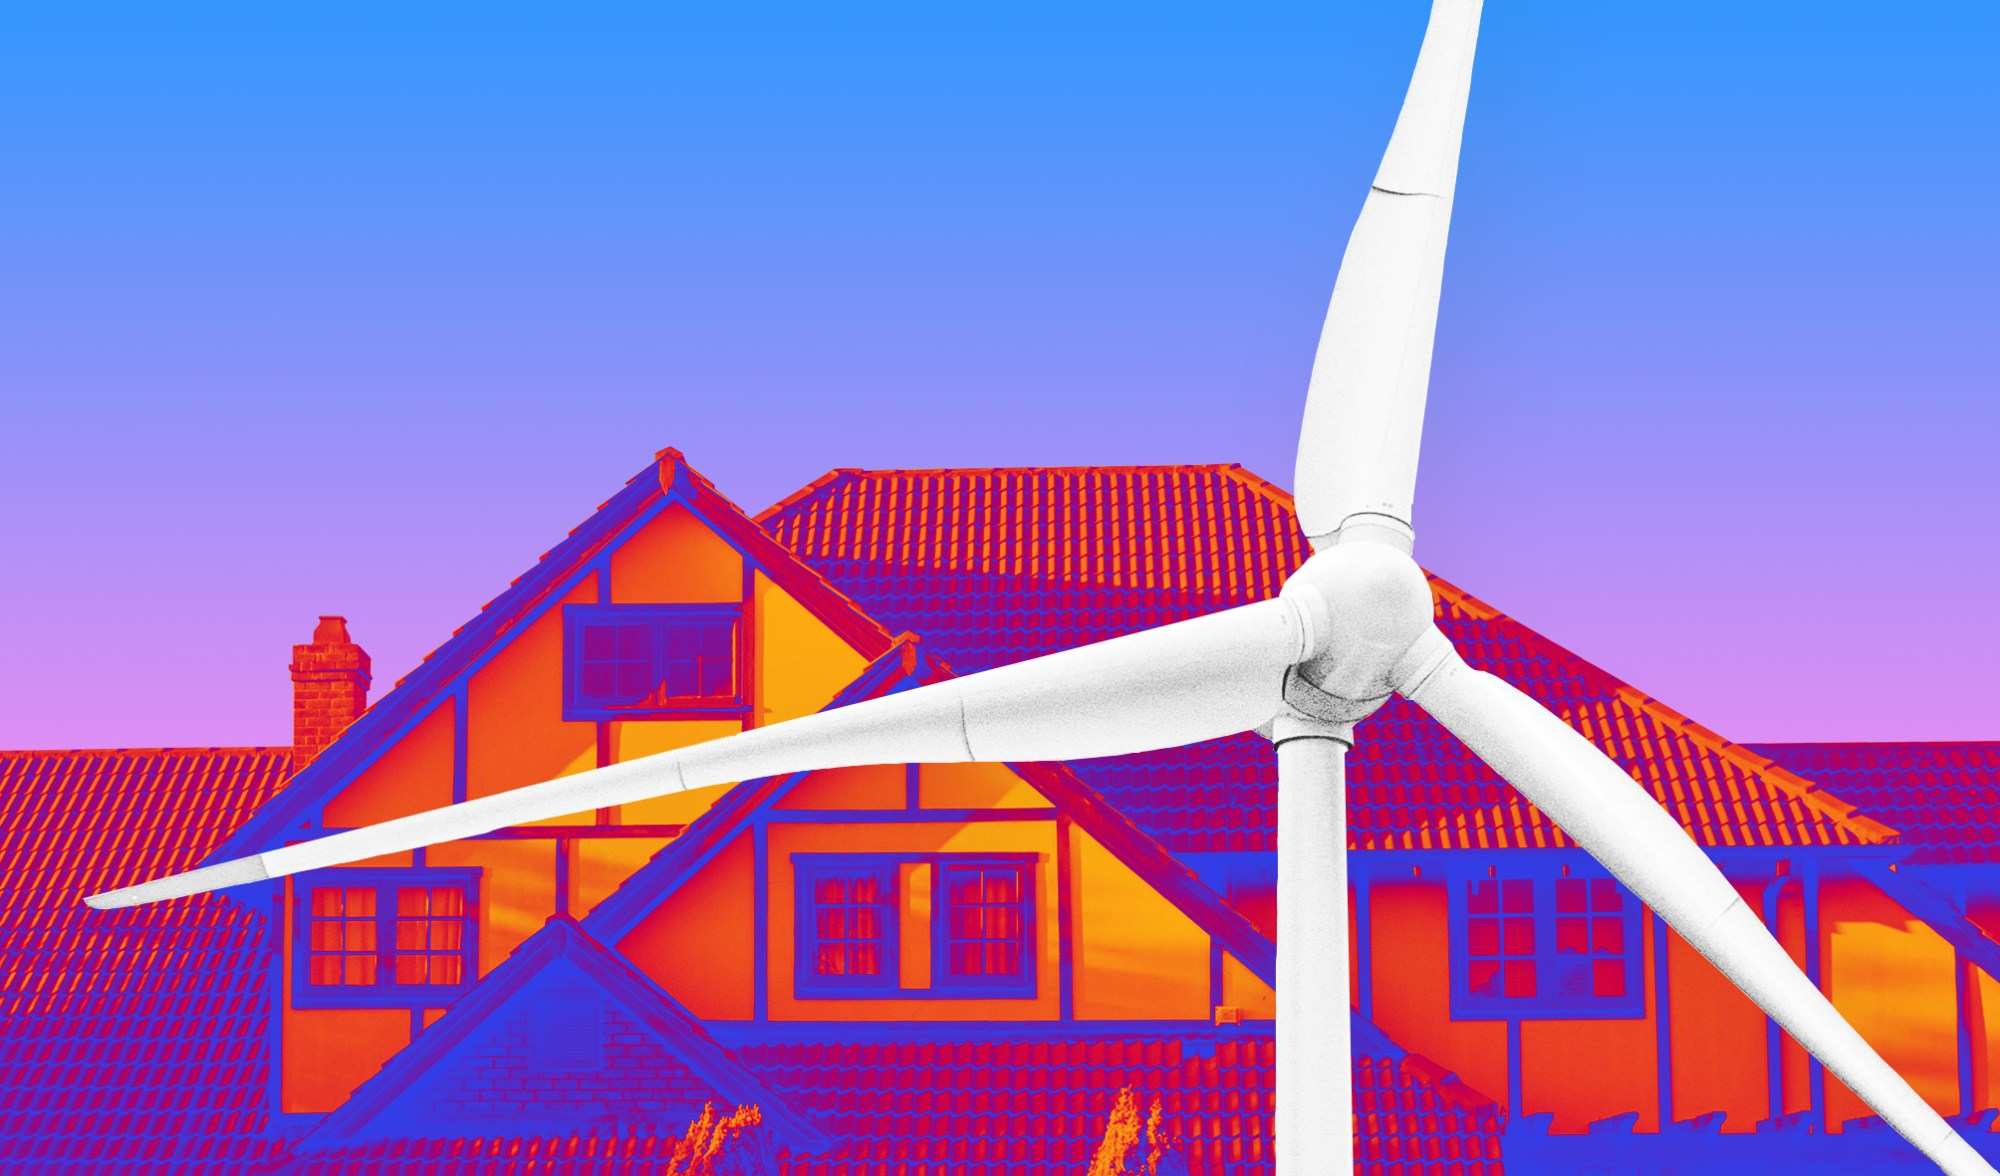 hight resolution of heat generating windmill illustration rona binay